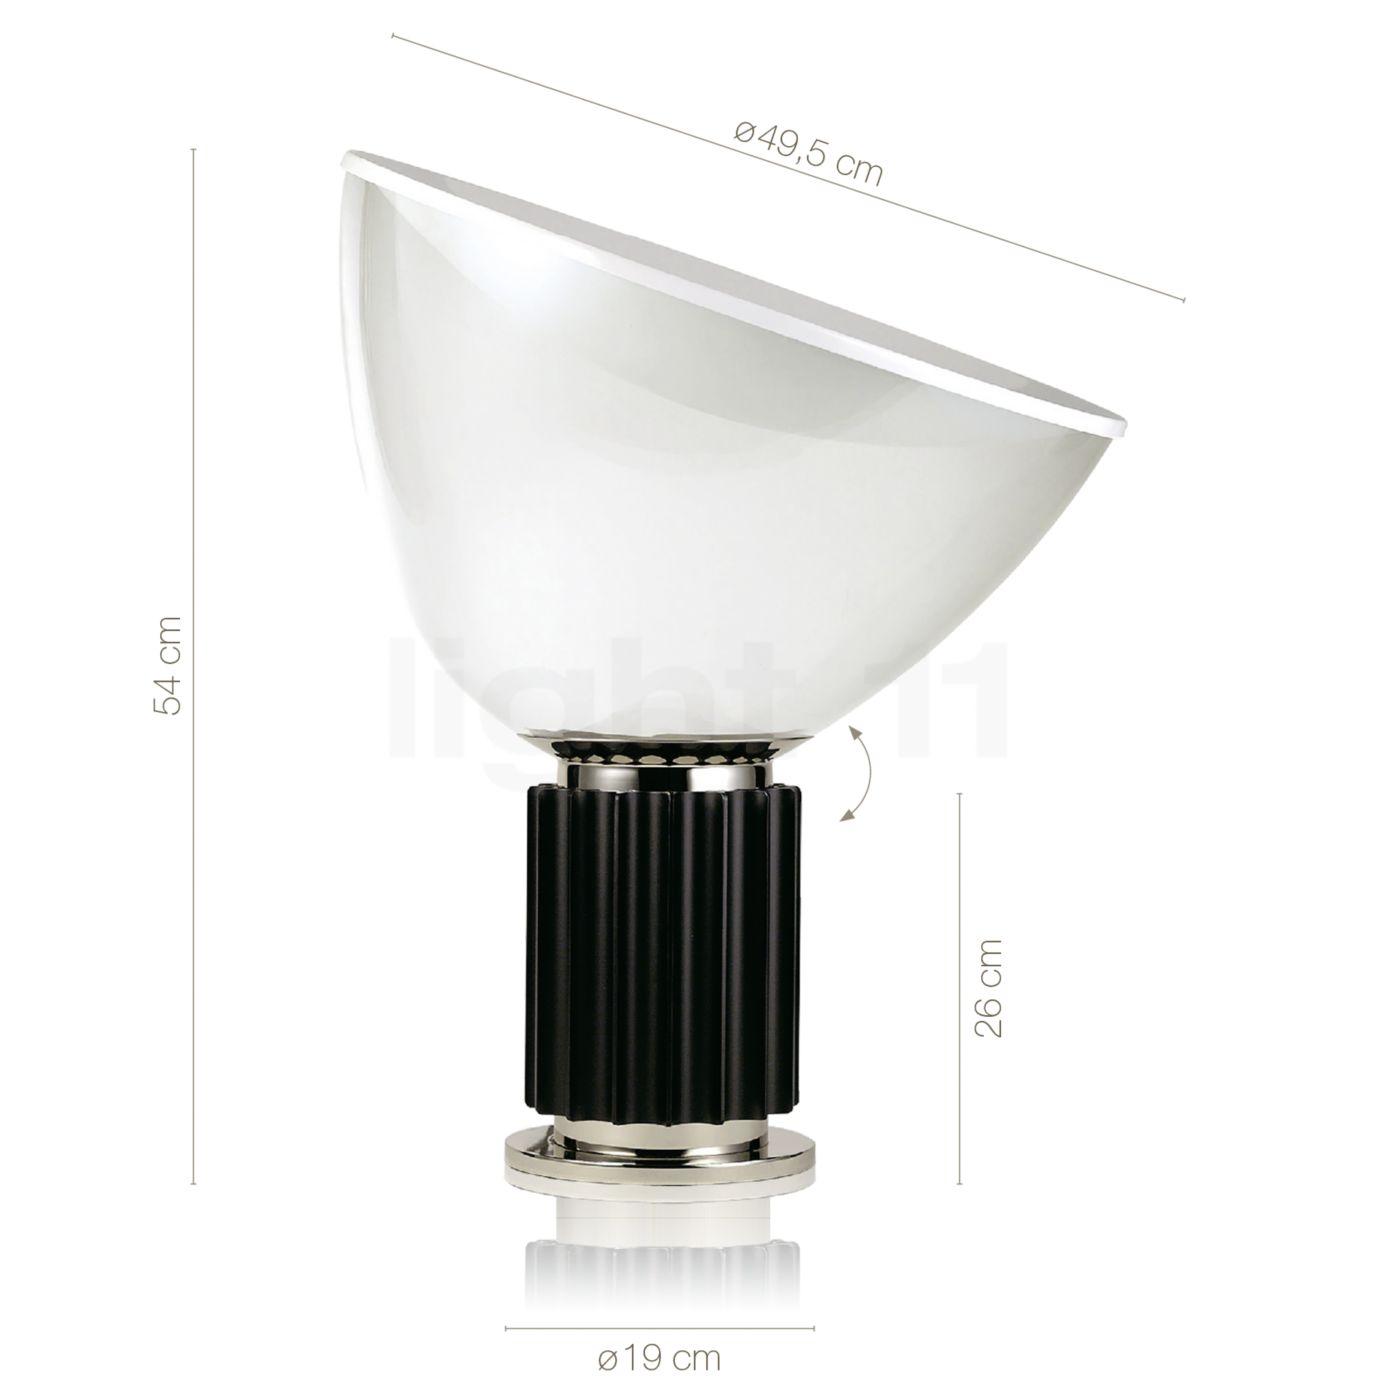 Buy Flos Taccia LED glass at light11.eu